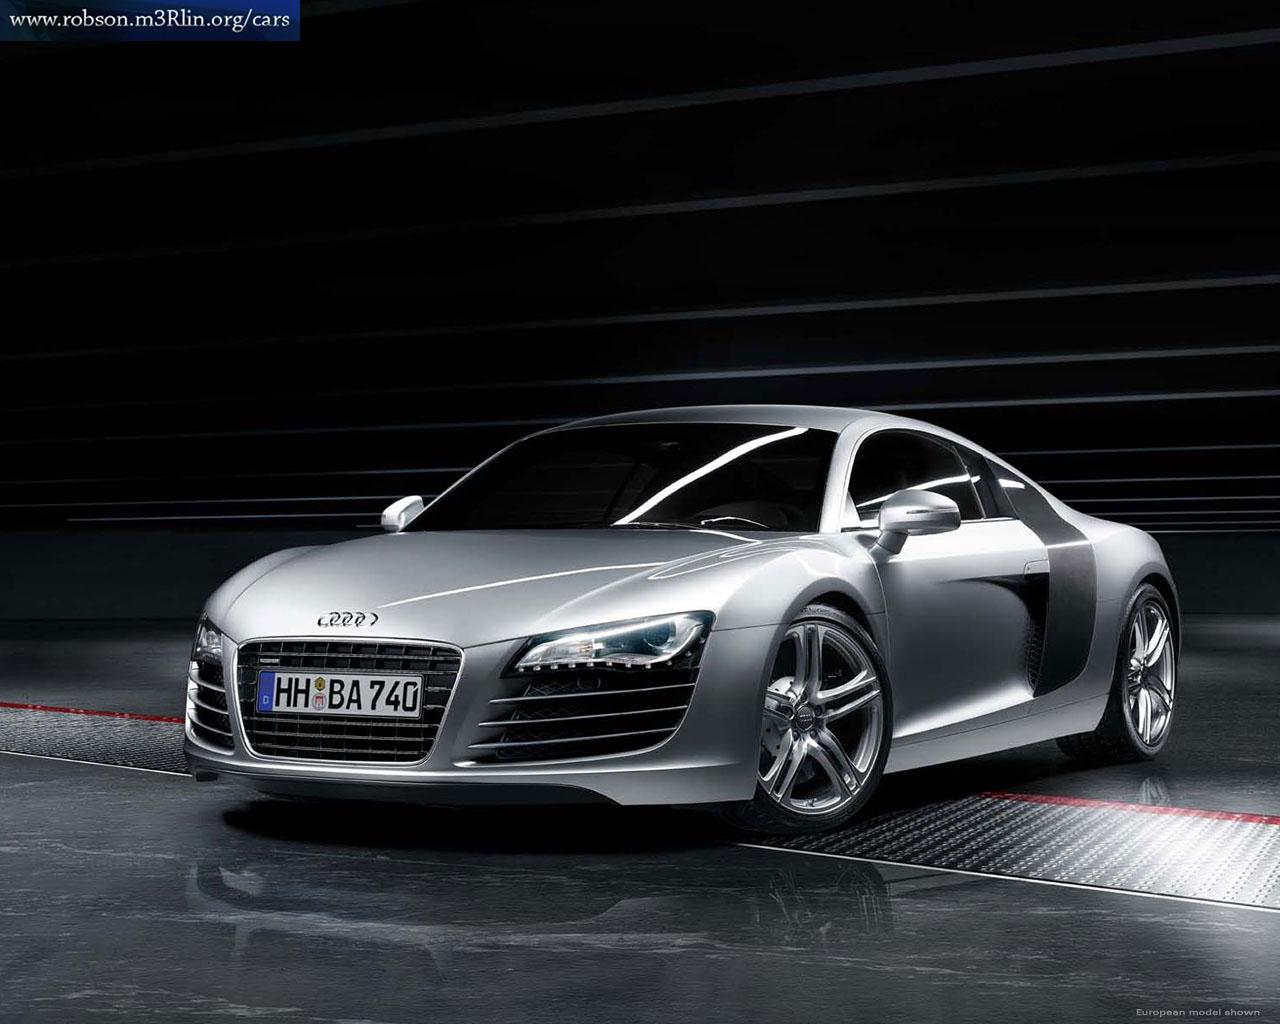 Audi R8 Road Car and Audi R8 Racing Car Cars   Pictures 1280x1024